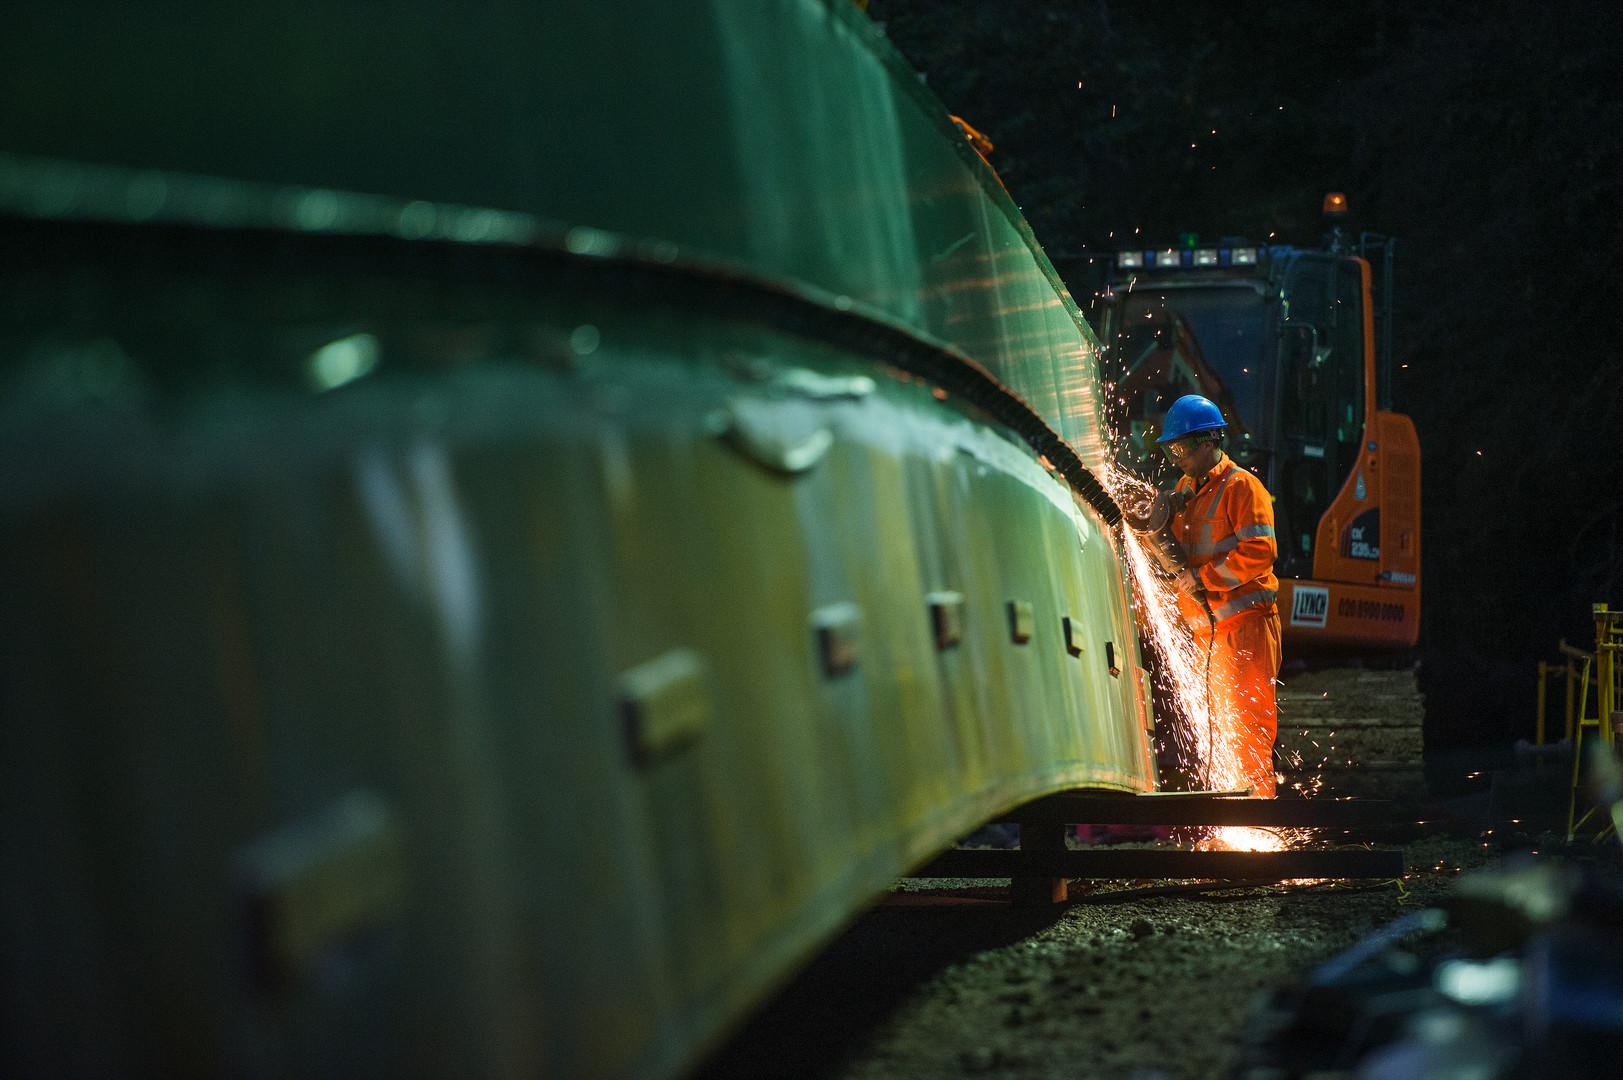 Industrial shoot,